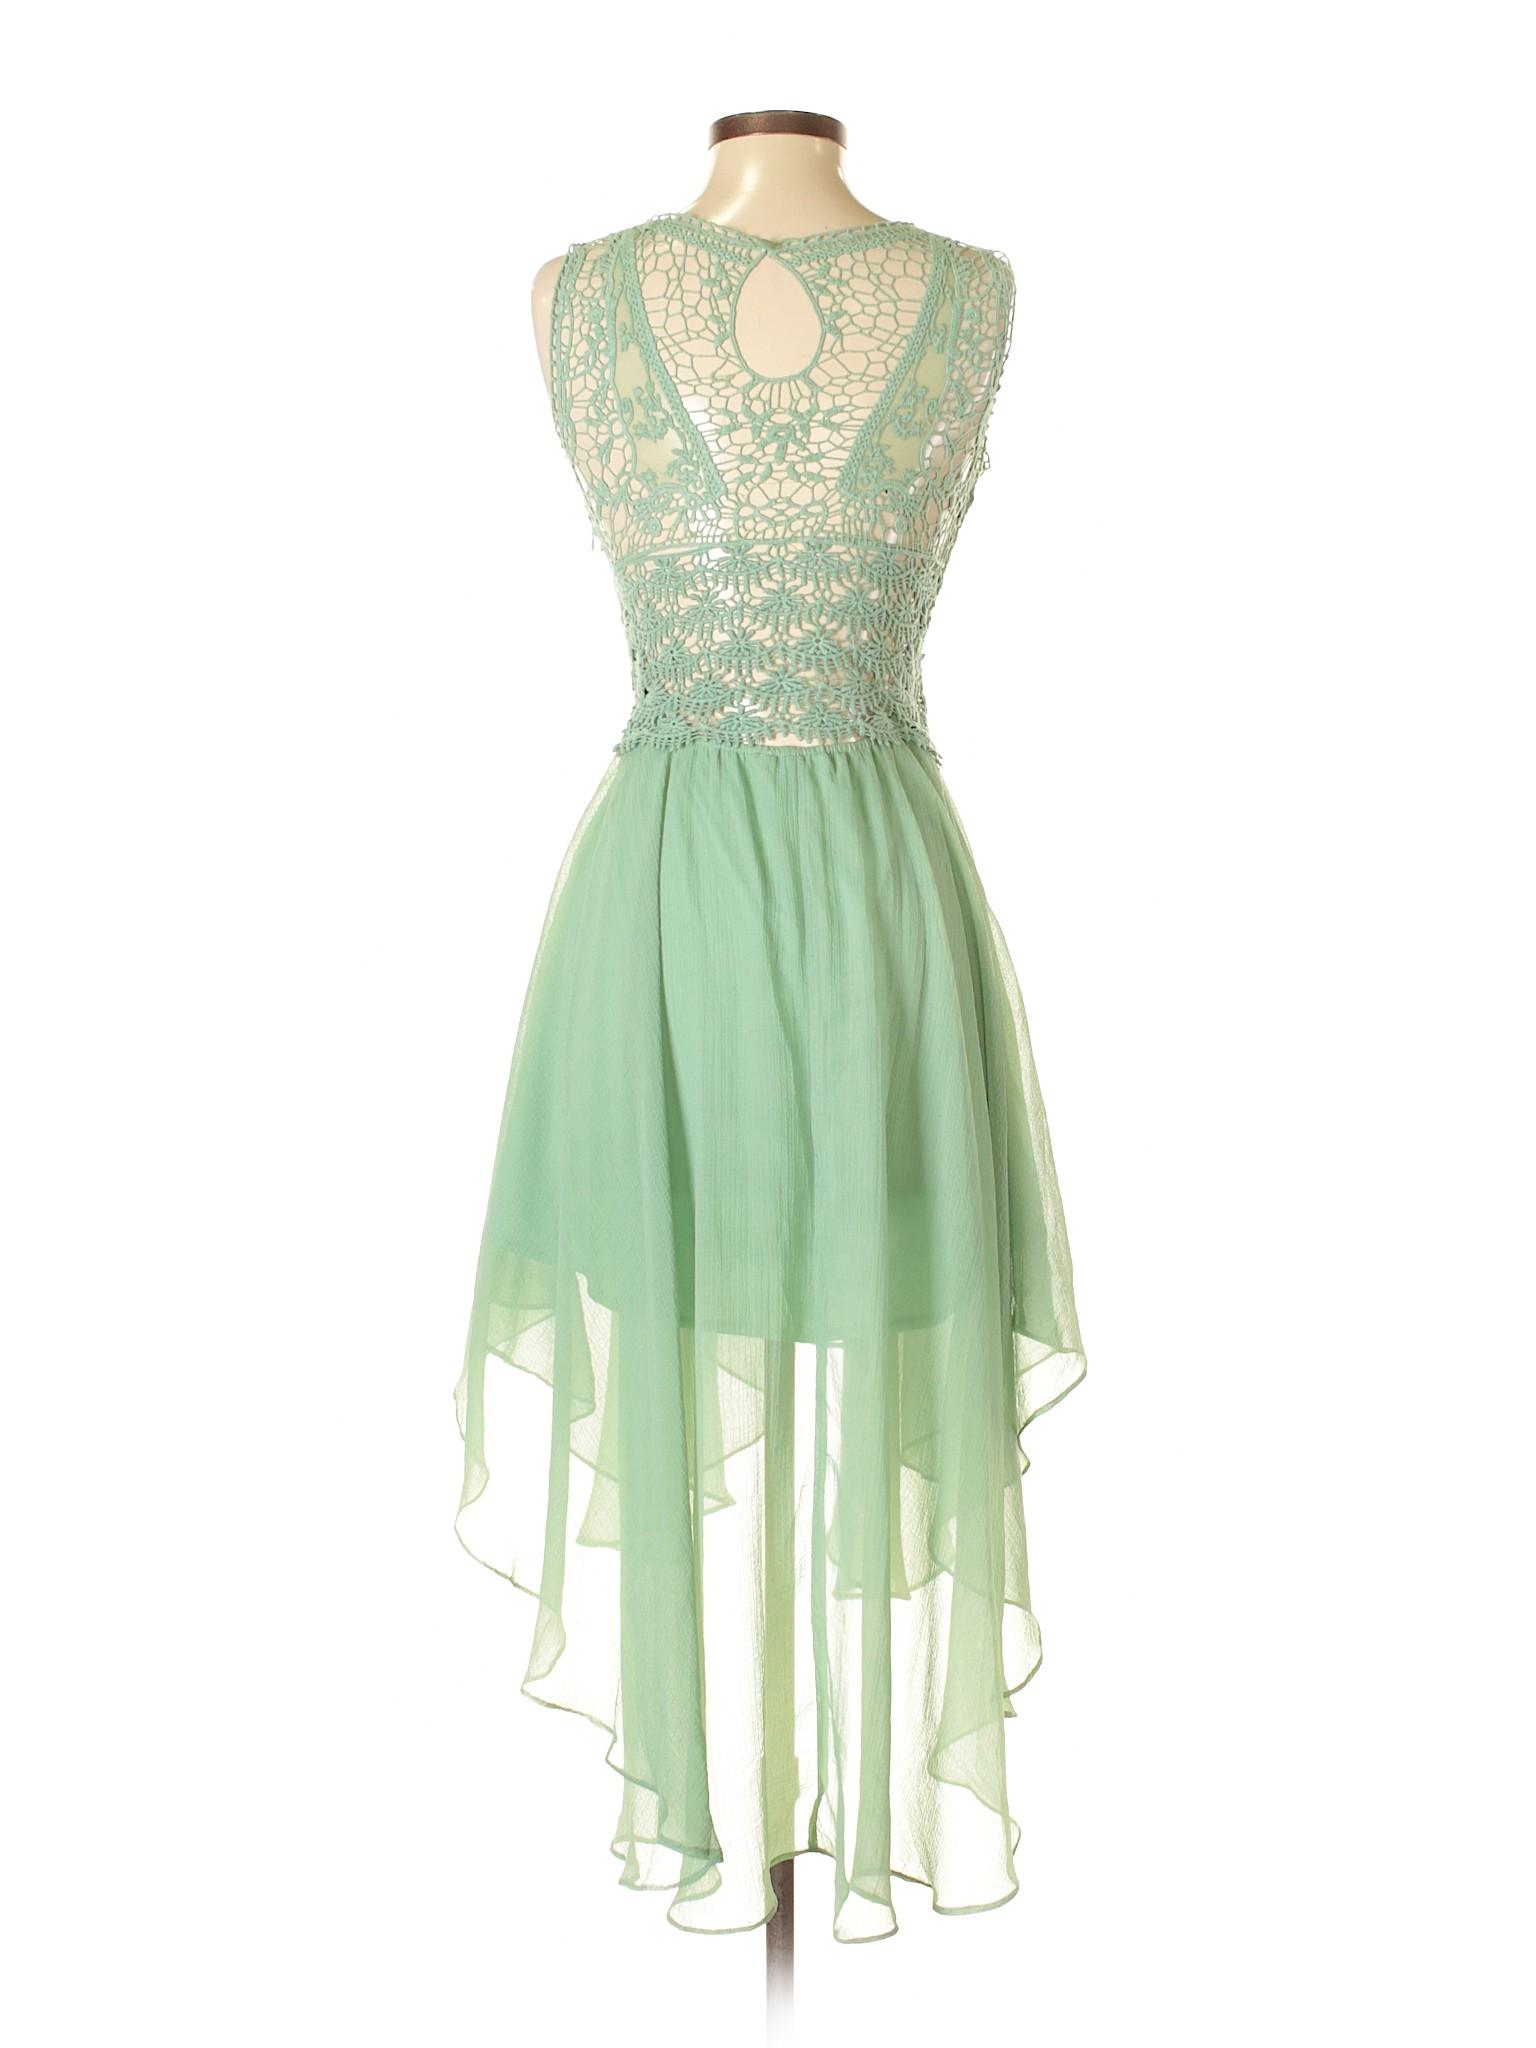 winter Boutique Marineblu winter Boutique Dress Casual Casual Dress Marineblu aq56E57w